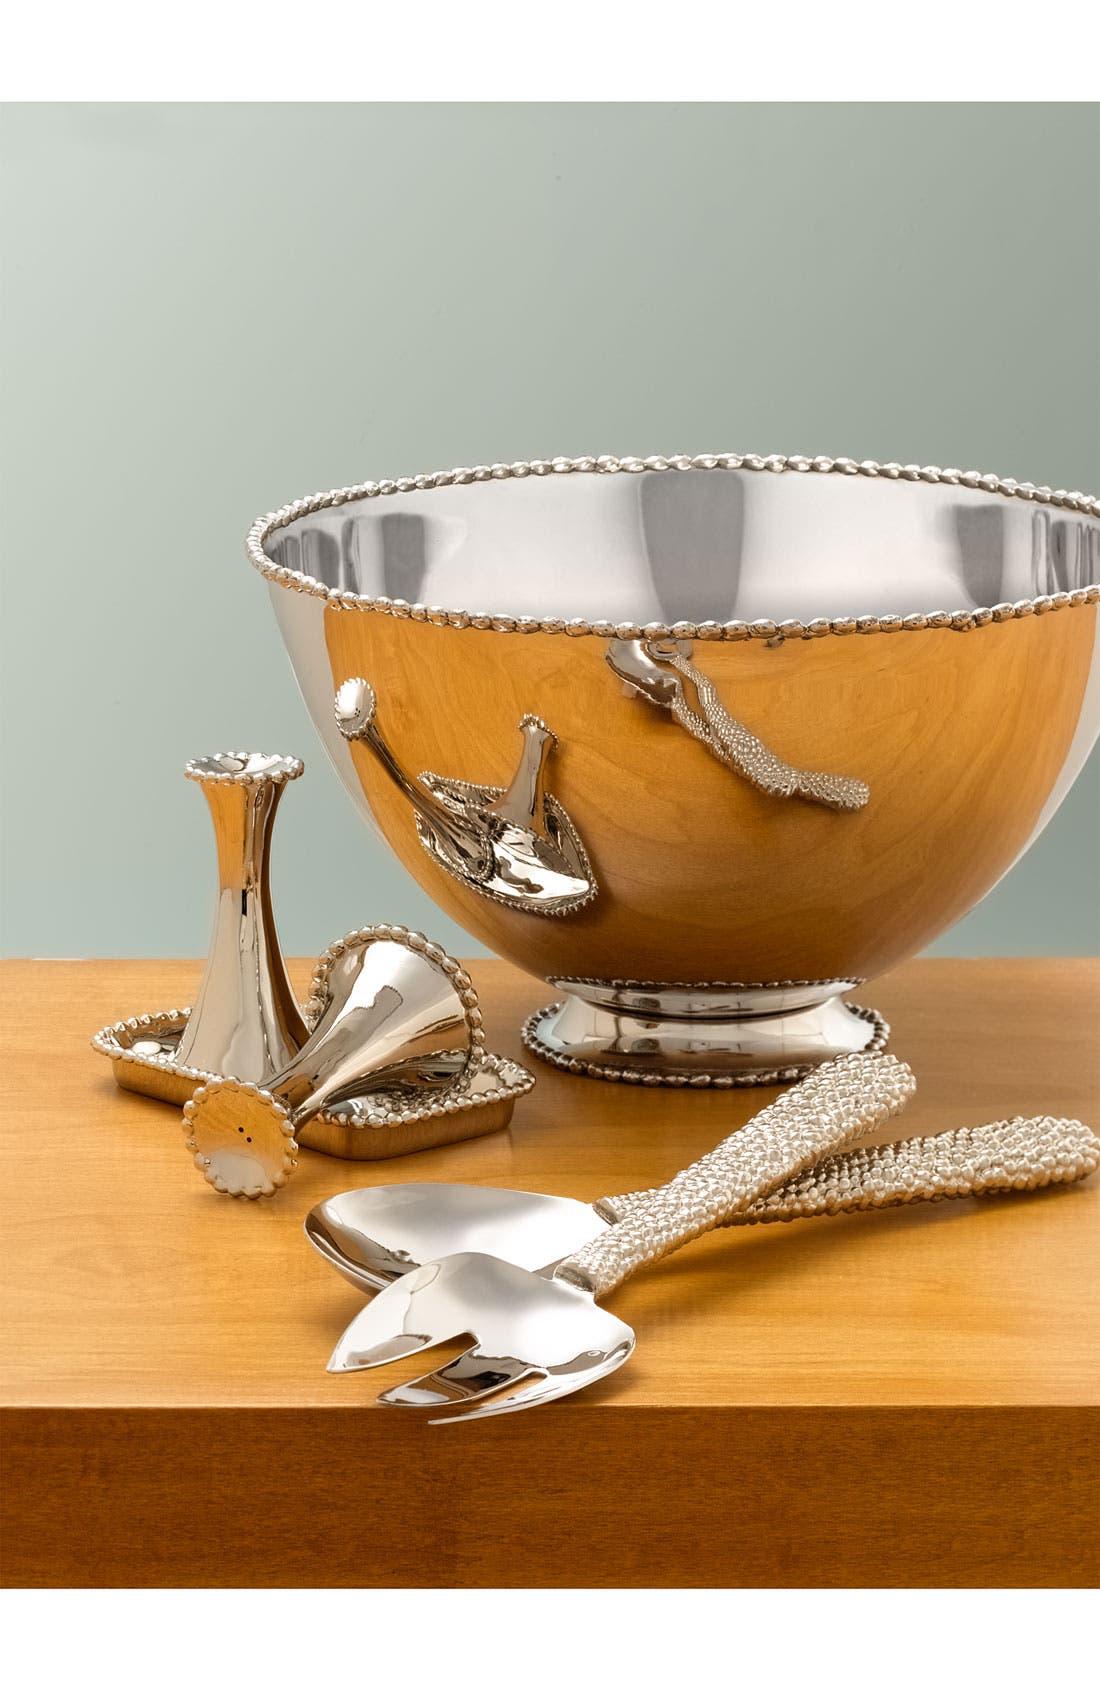 Alternate Image 2  - Michael Aram 'Molten' Serving Bowl